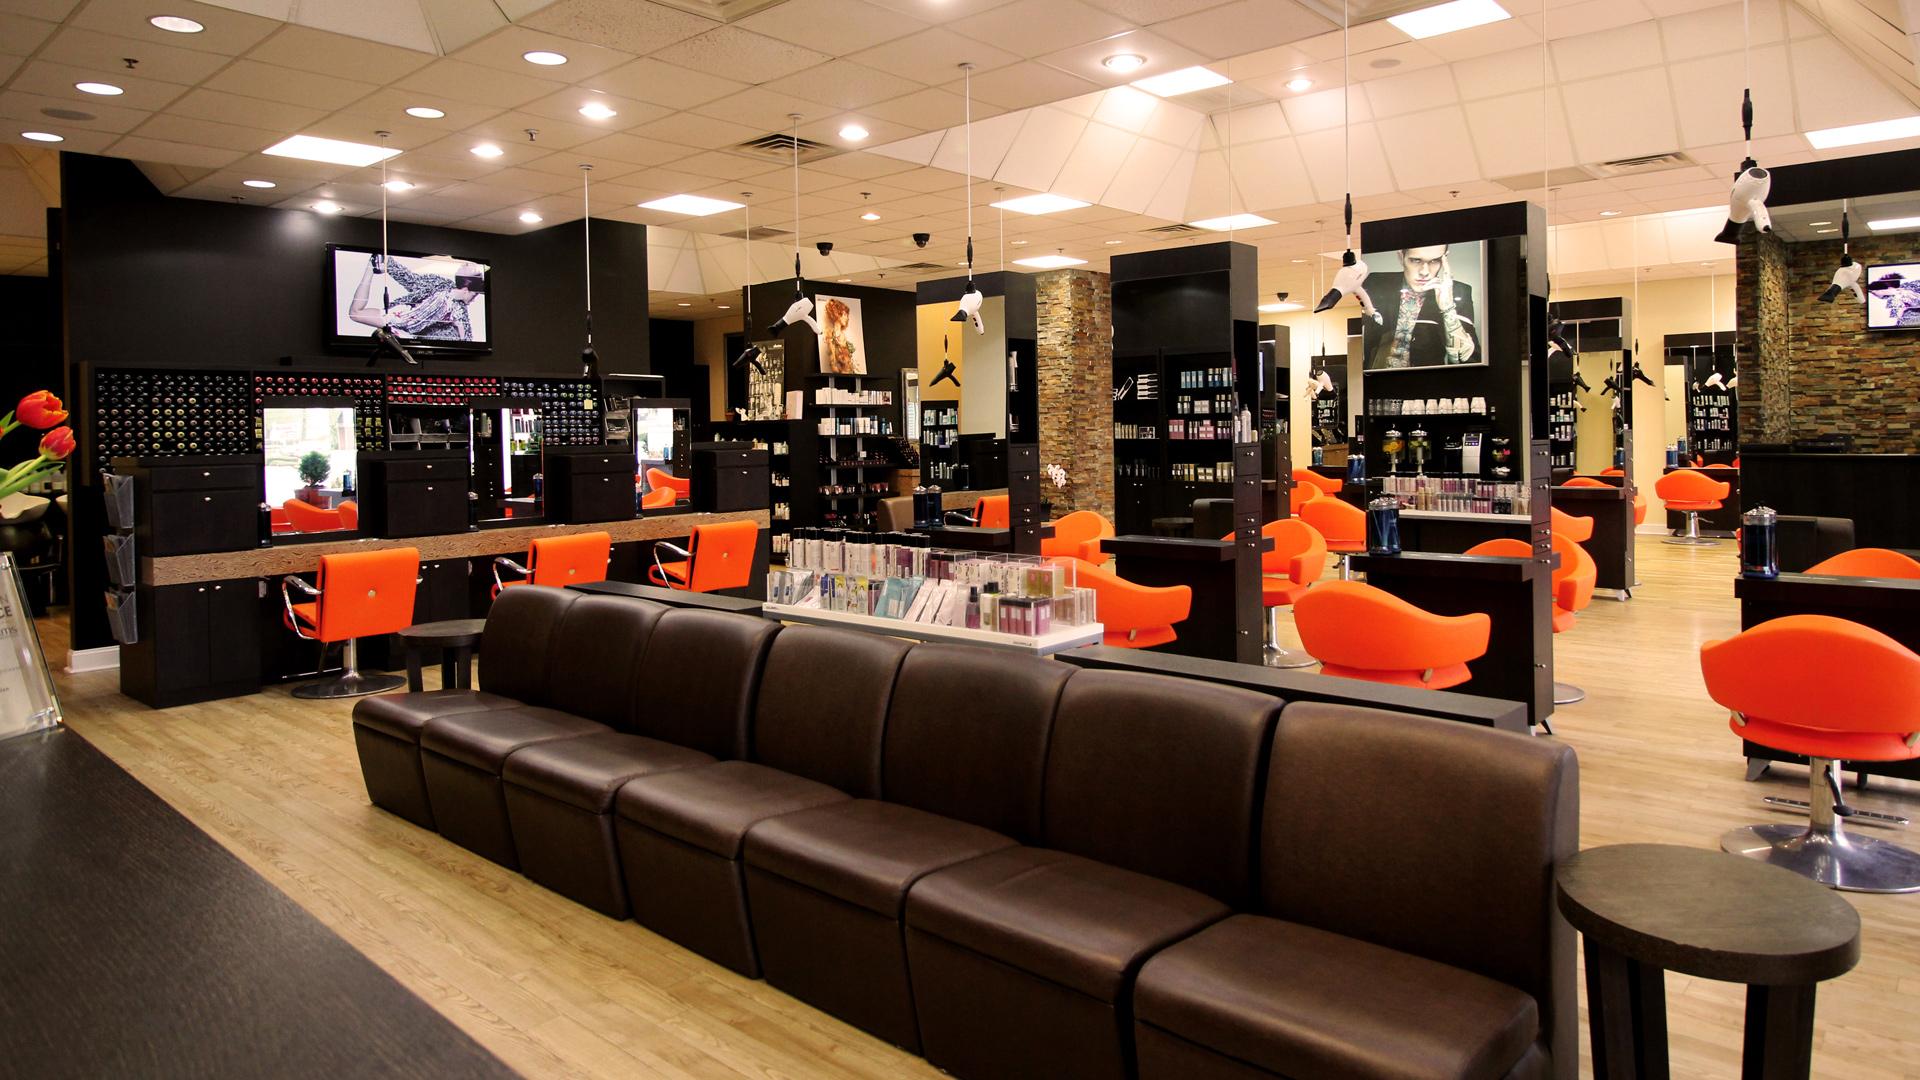 moxie-blue-salon-lobby (1).jpg